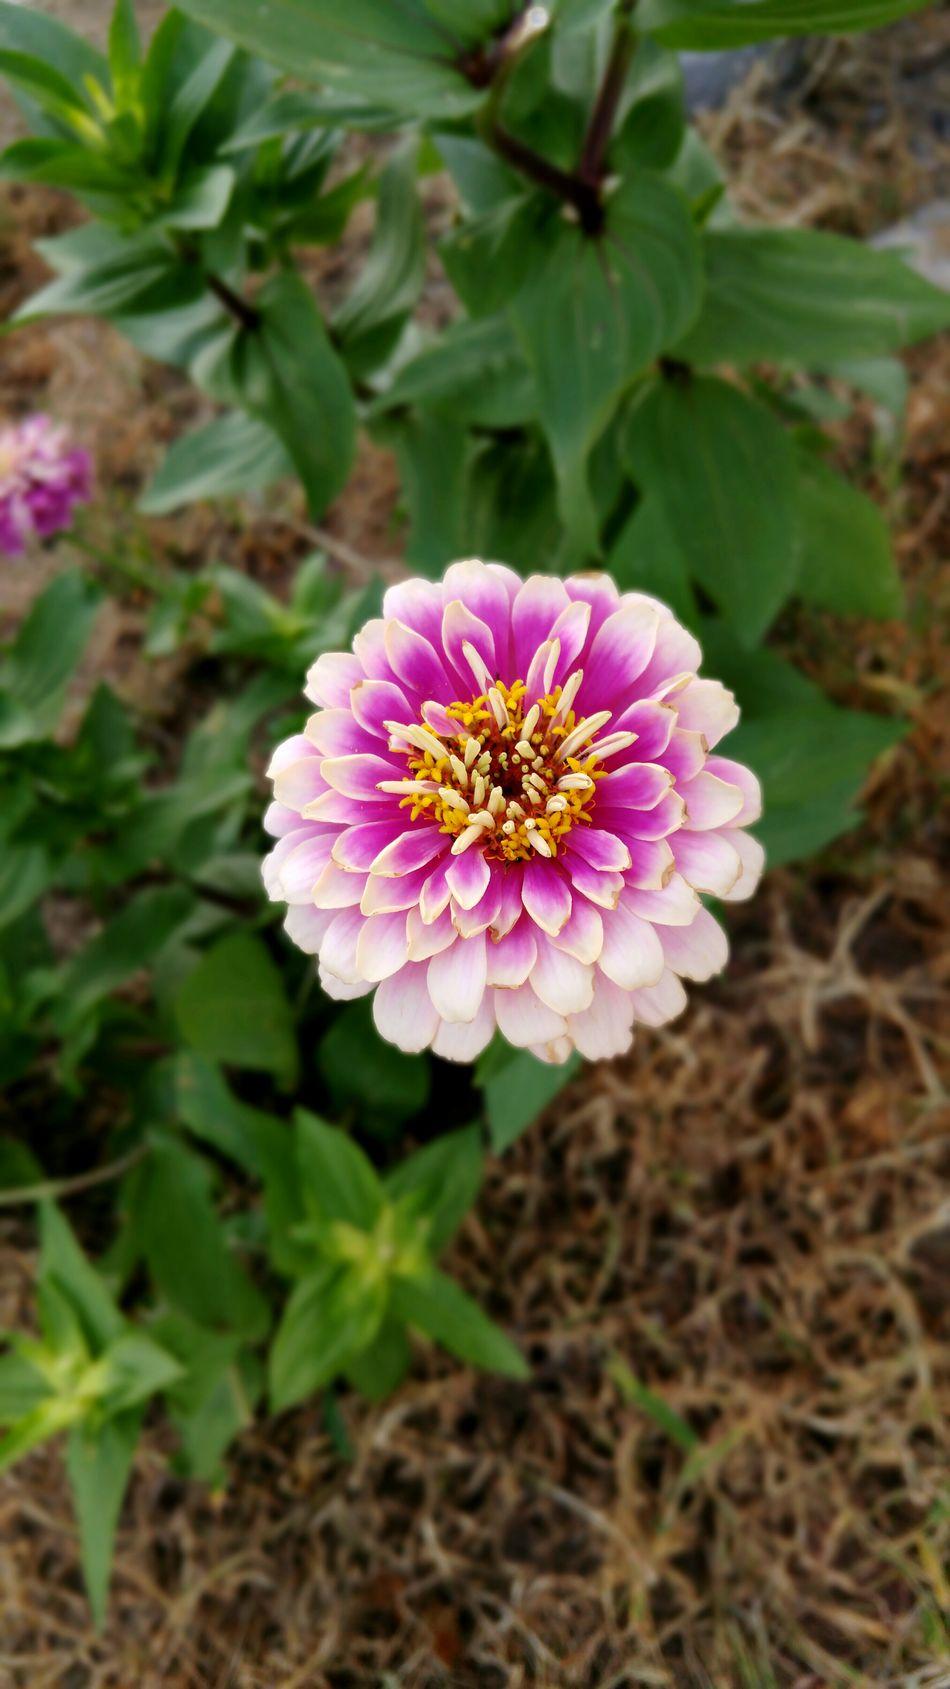 Nature On Your Doorstep Good Morning Everyone✌❤🌺